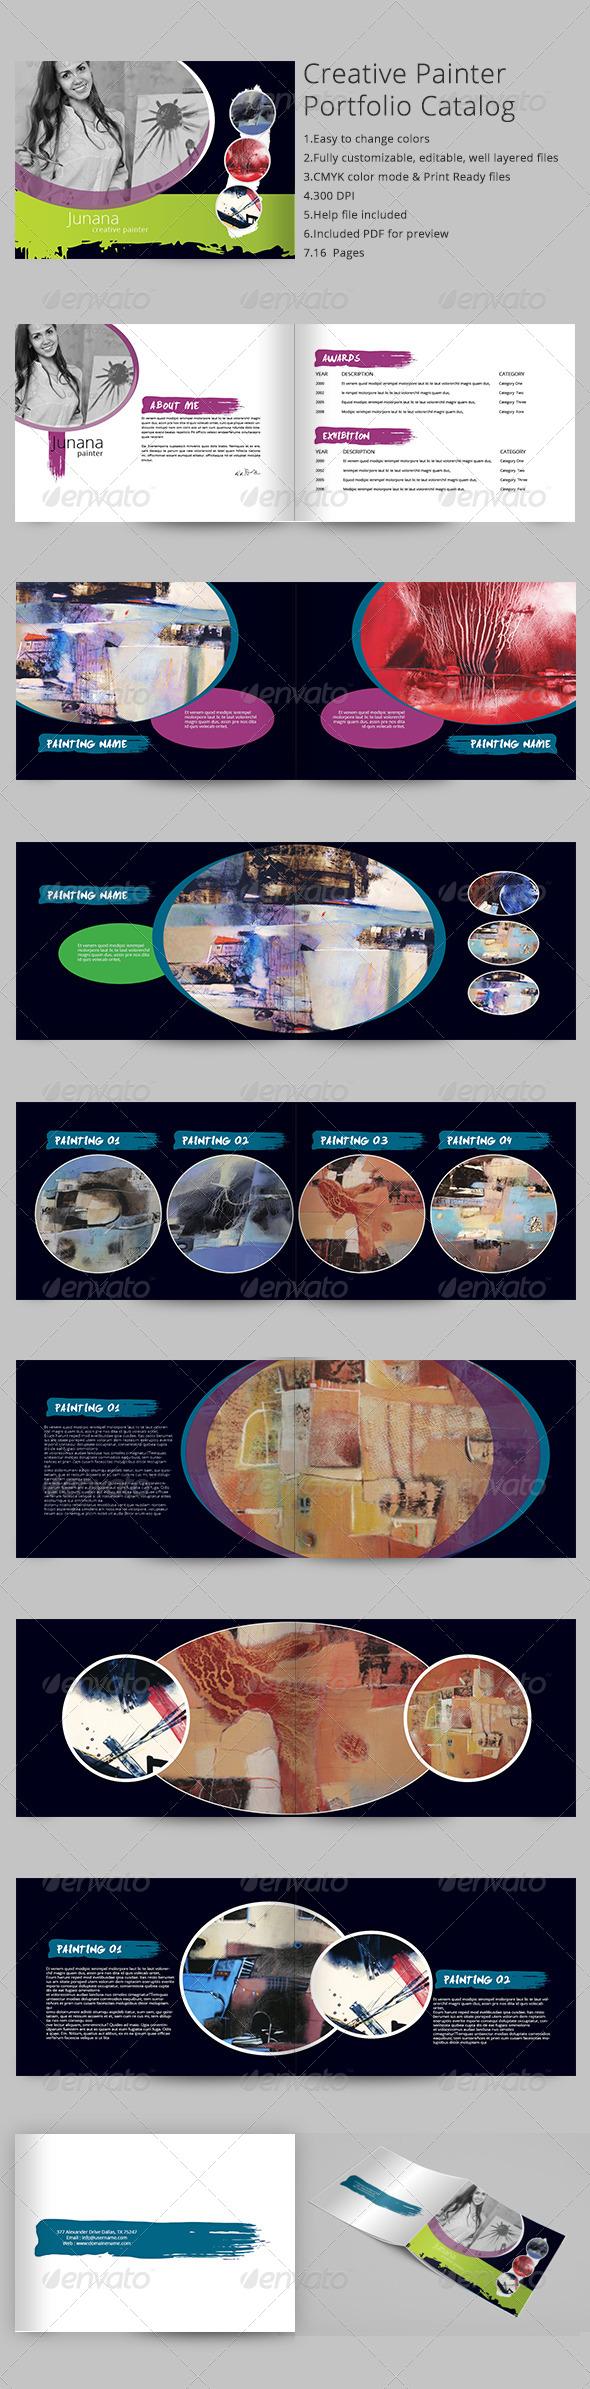 Creative Painter Portfolio Catalog Brochure - Portfolio Brochures